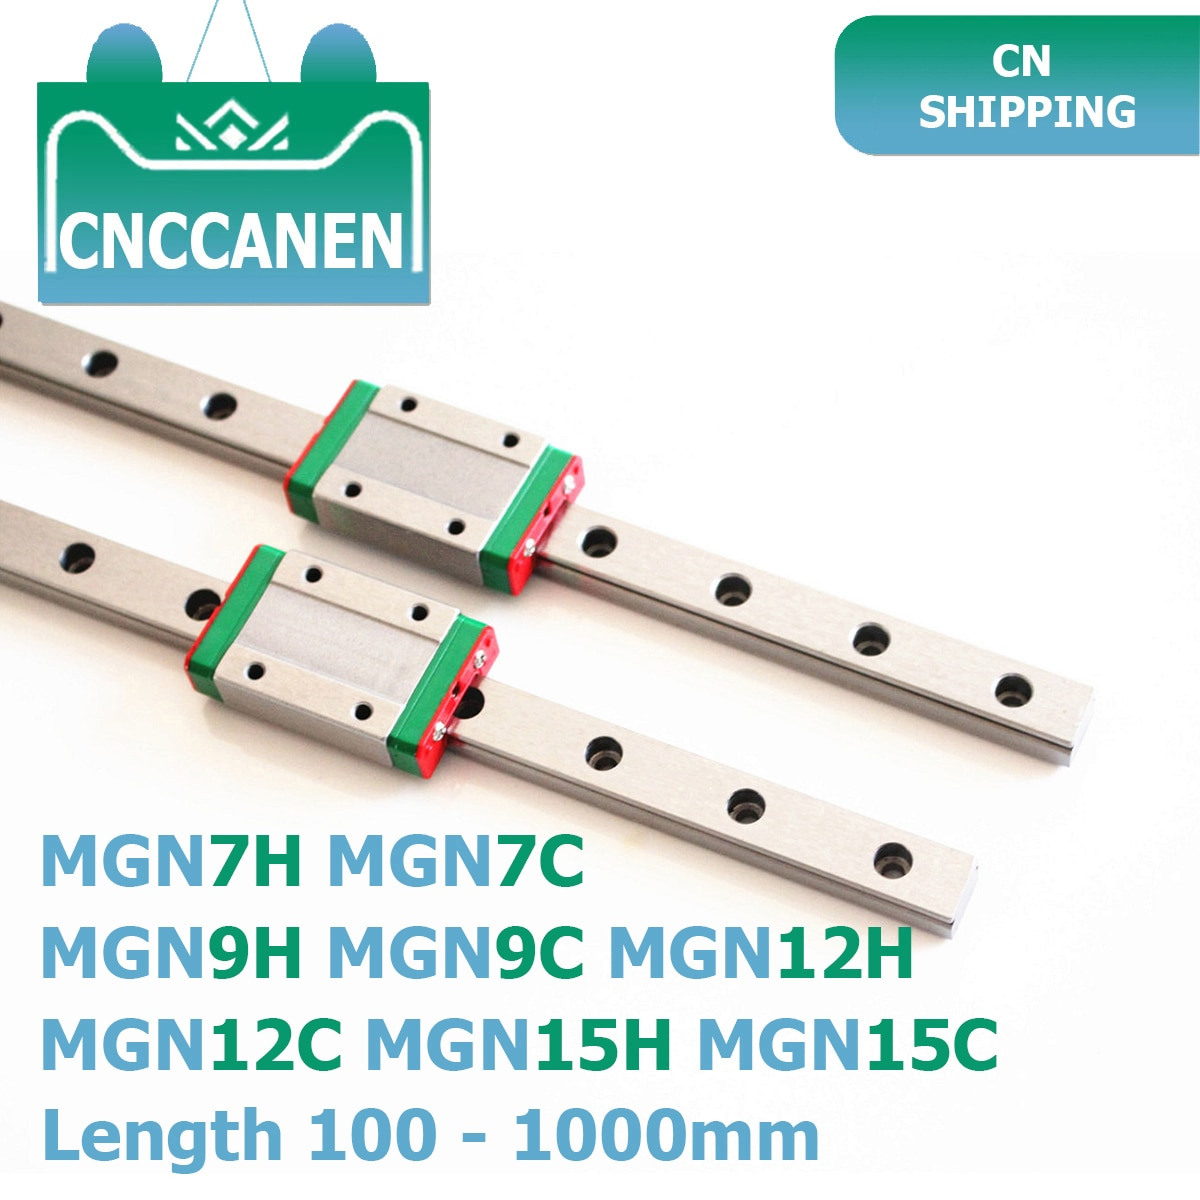 MGN7 MGN9 MGN12 MGN15 100-1000mm miniatura de carril lineal diapositiva 2 uds MGN9 guía lineal + 2 uds MGN9H o MGN9C transporte 3D impresora CNC